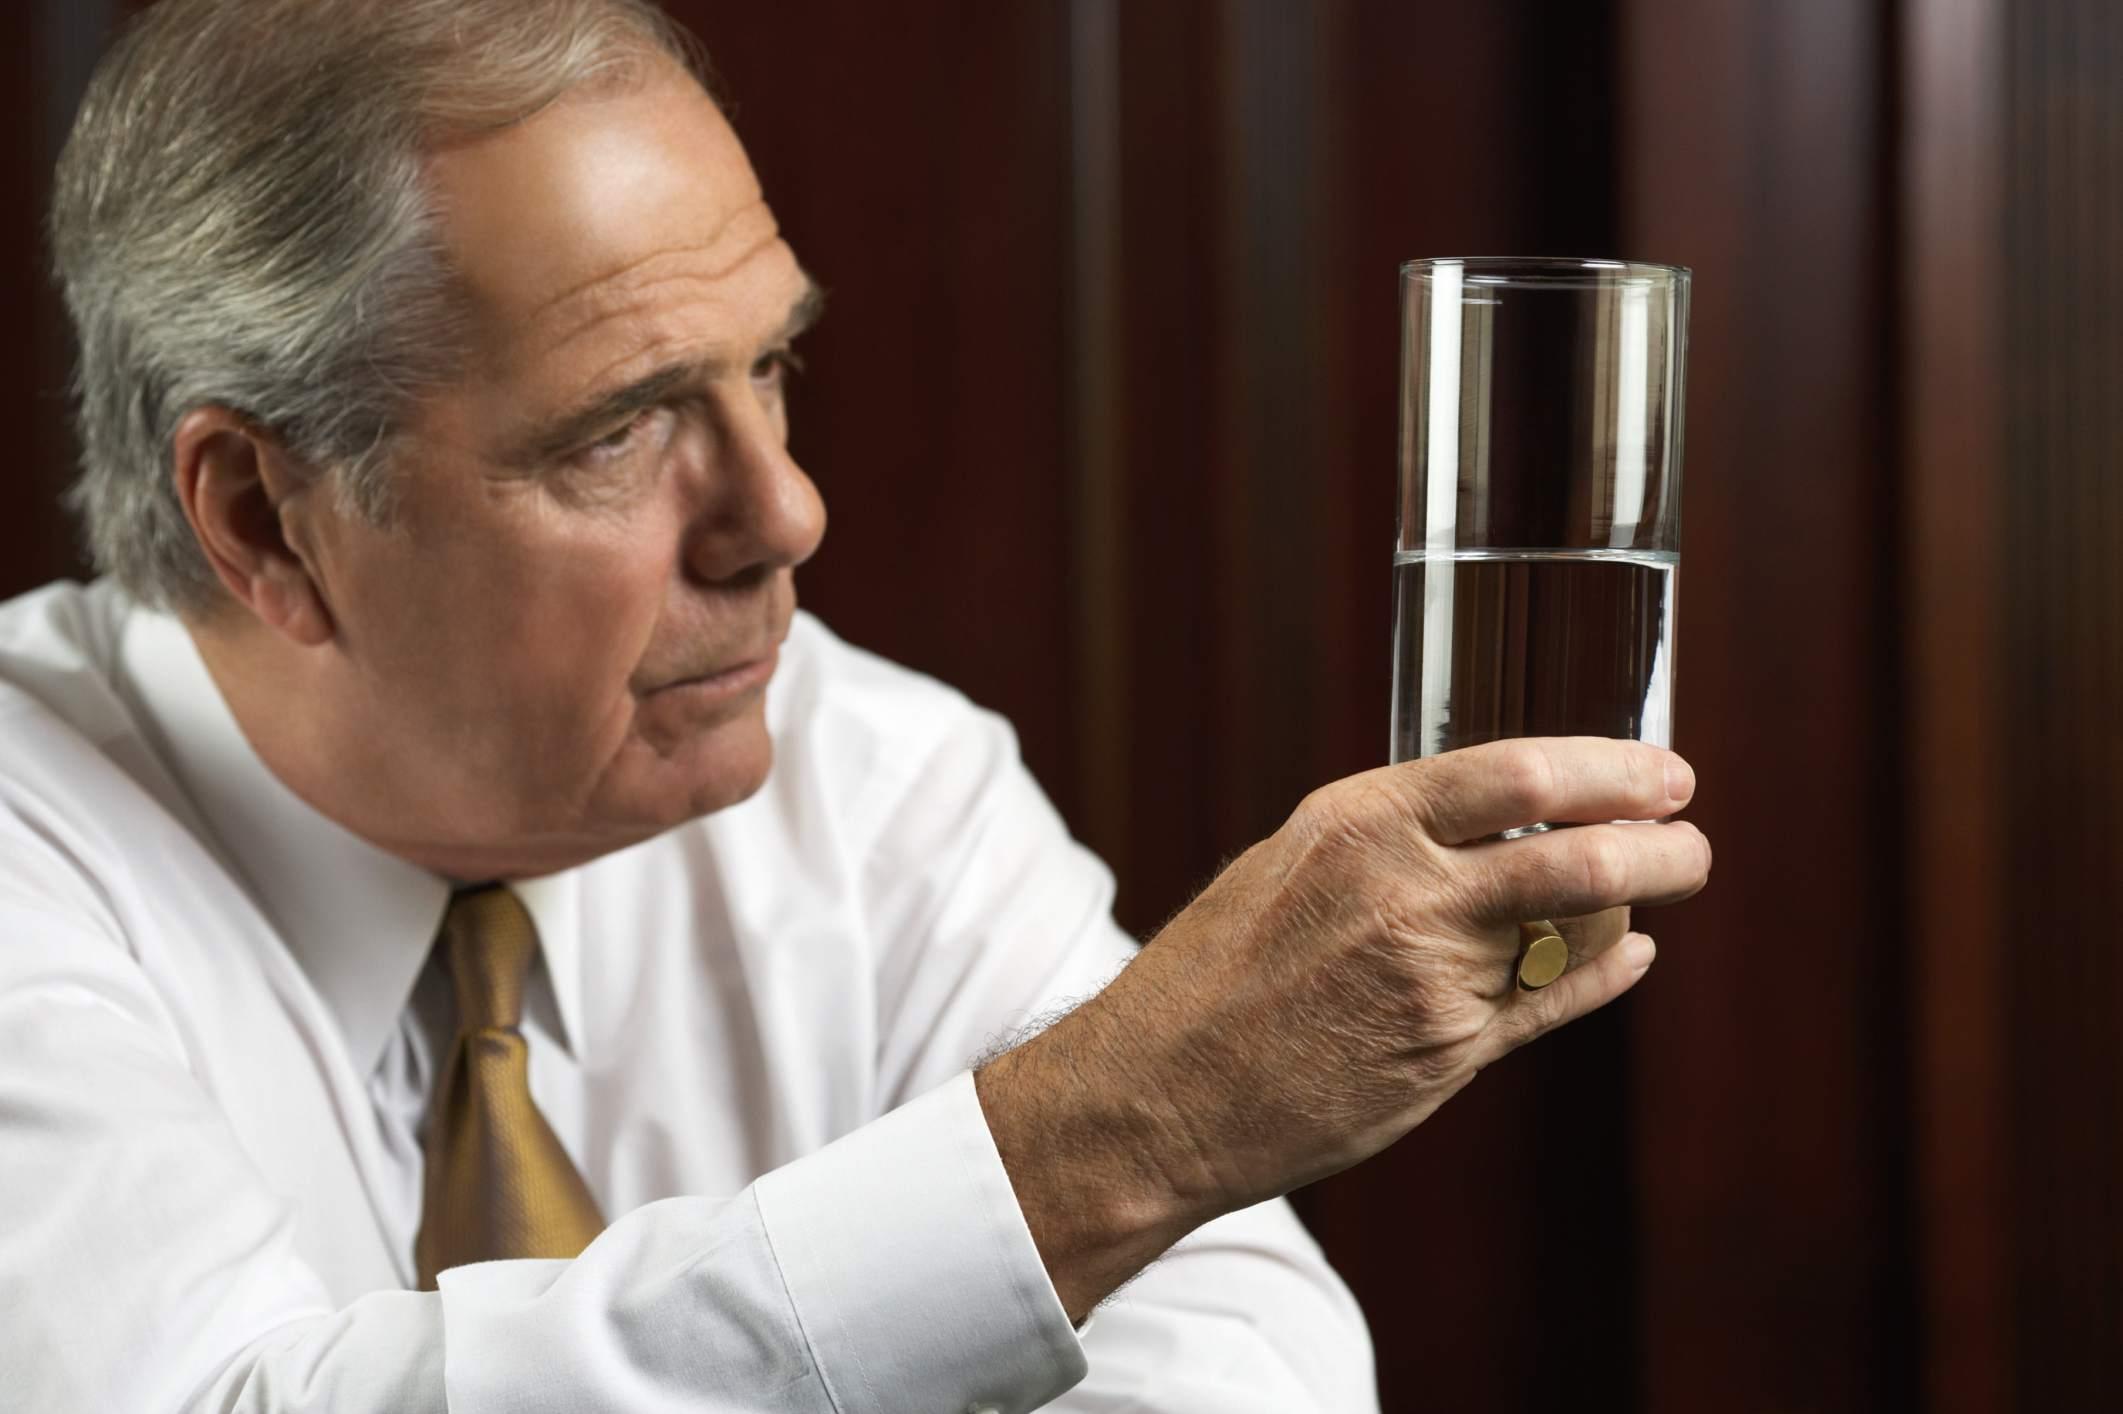 senior man looking at half full glass